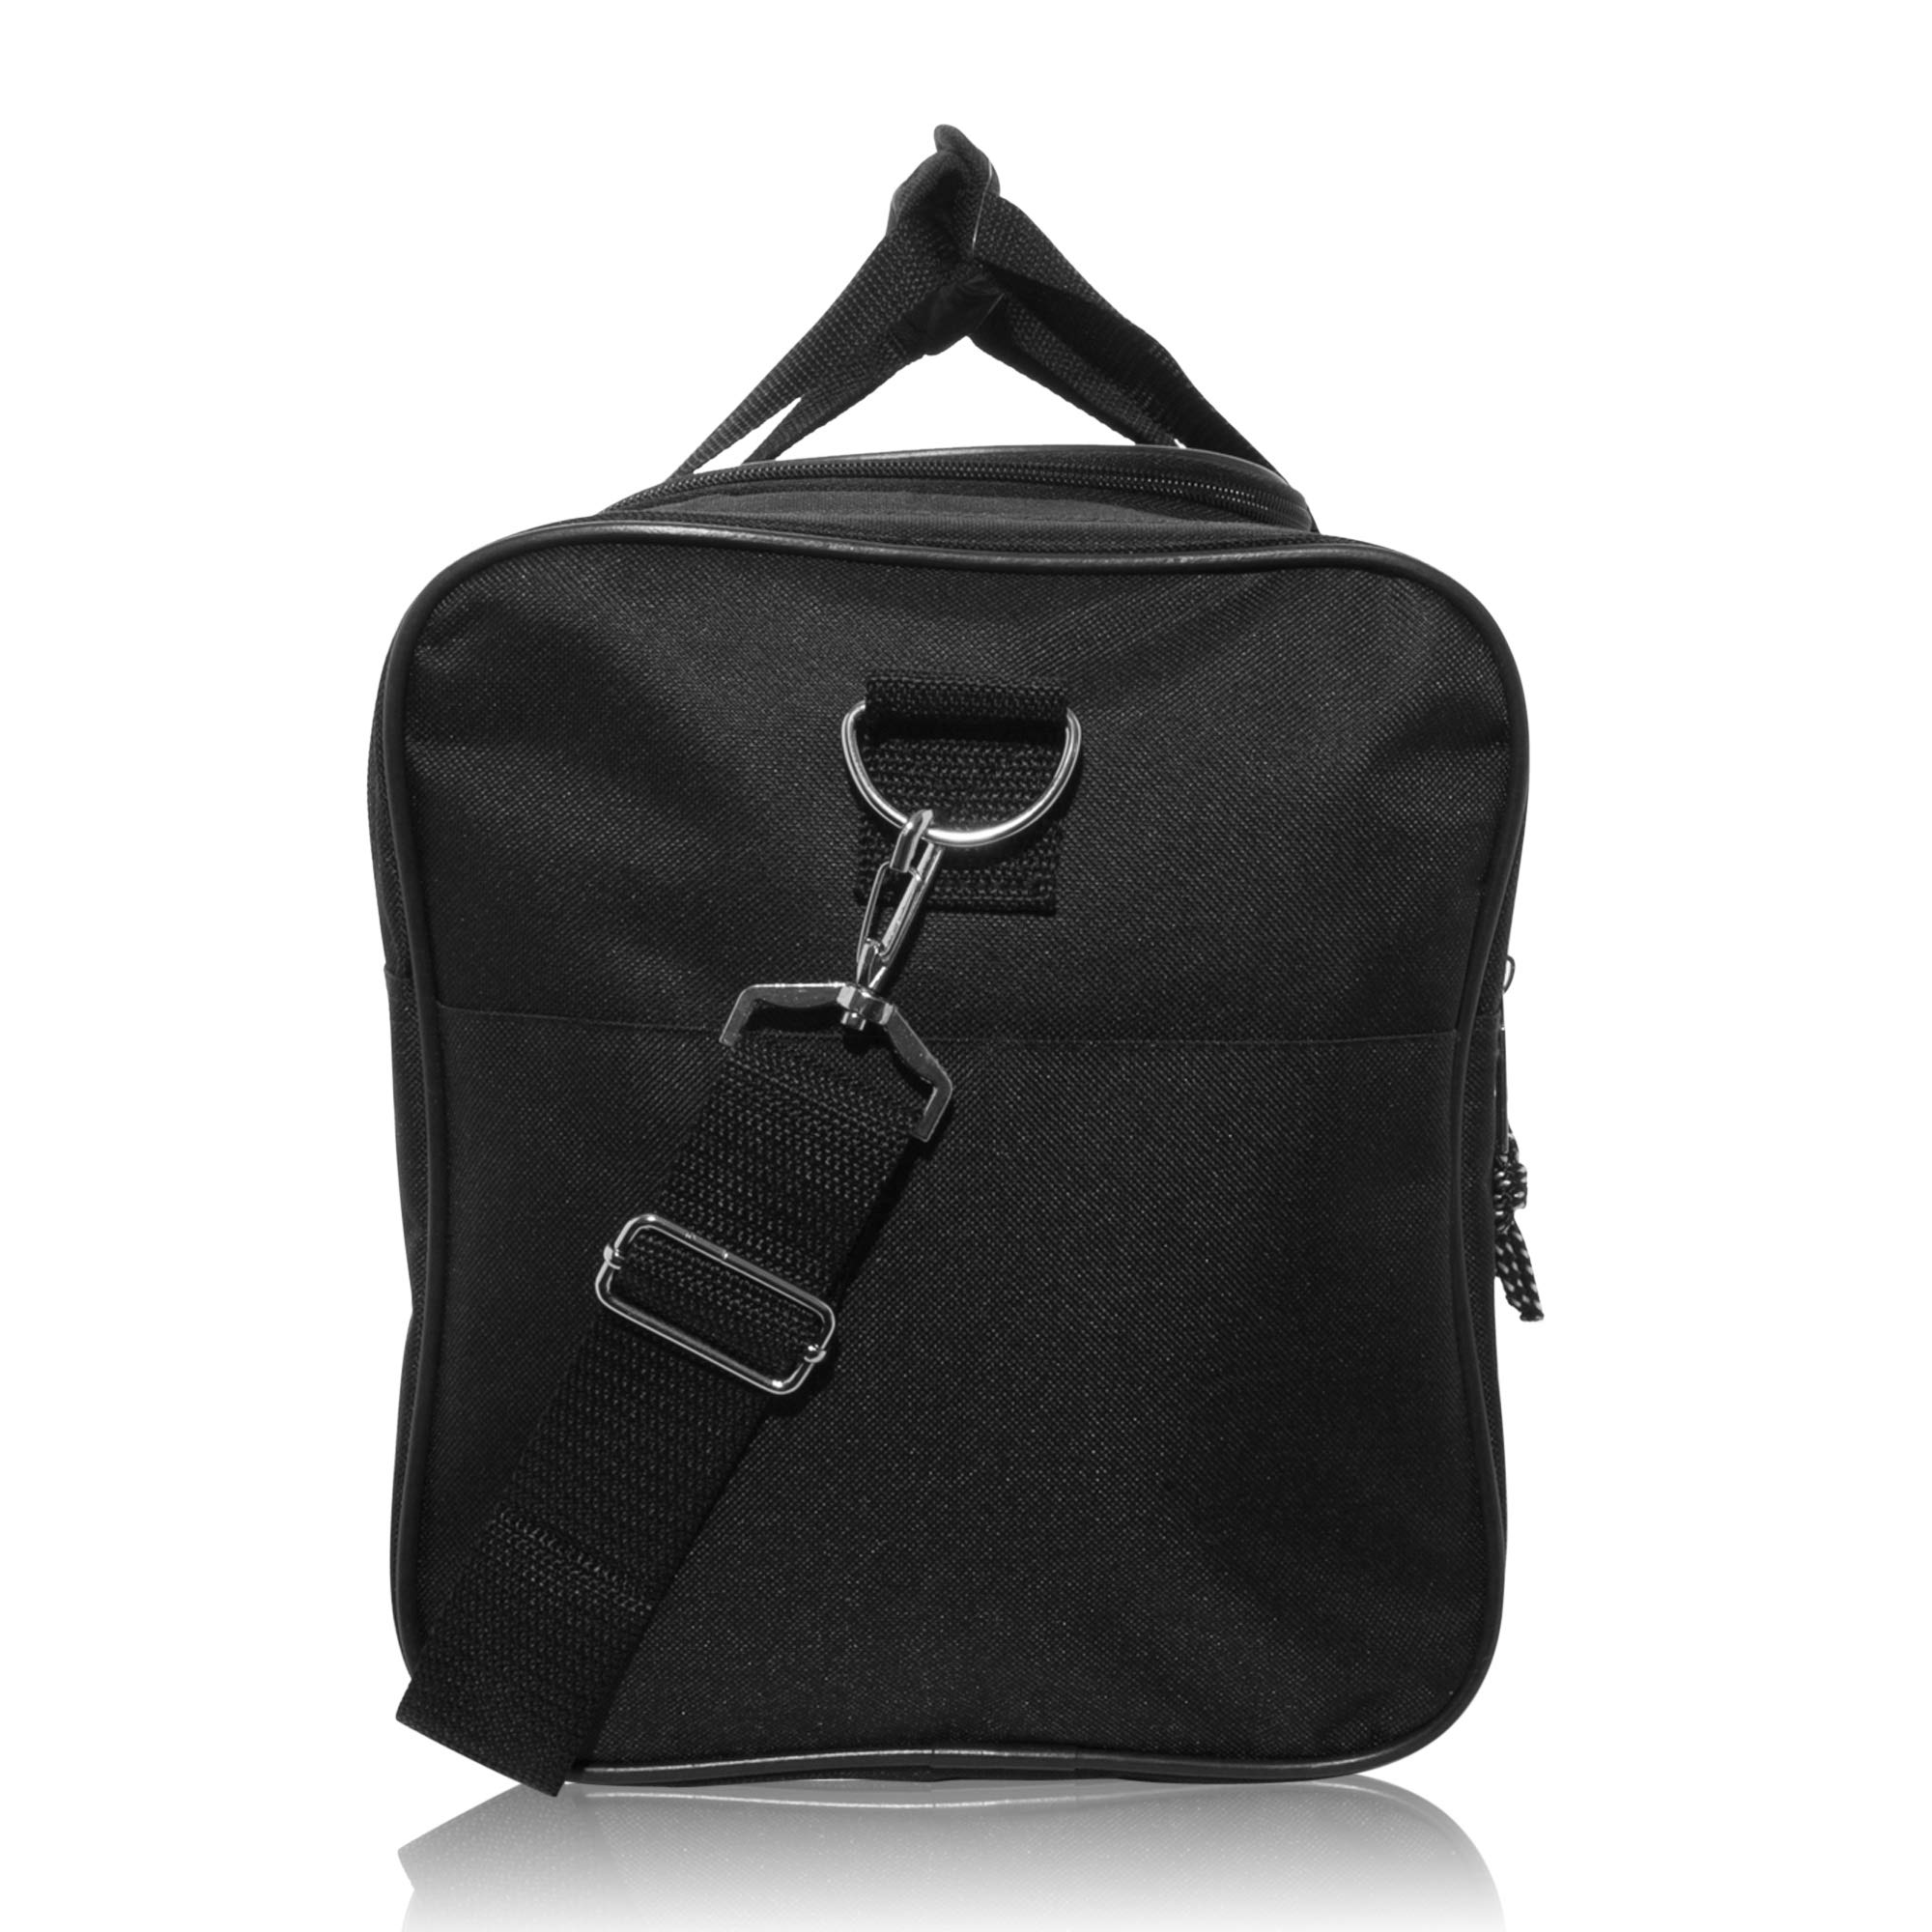 DALIX Blank Duffle Bag Duffel Bag in Black Gym Bag - DF-005-Black   Sports  Duffels   Clothing, Shoes   Jewelry - tibs 5a24a02d17